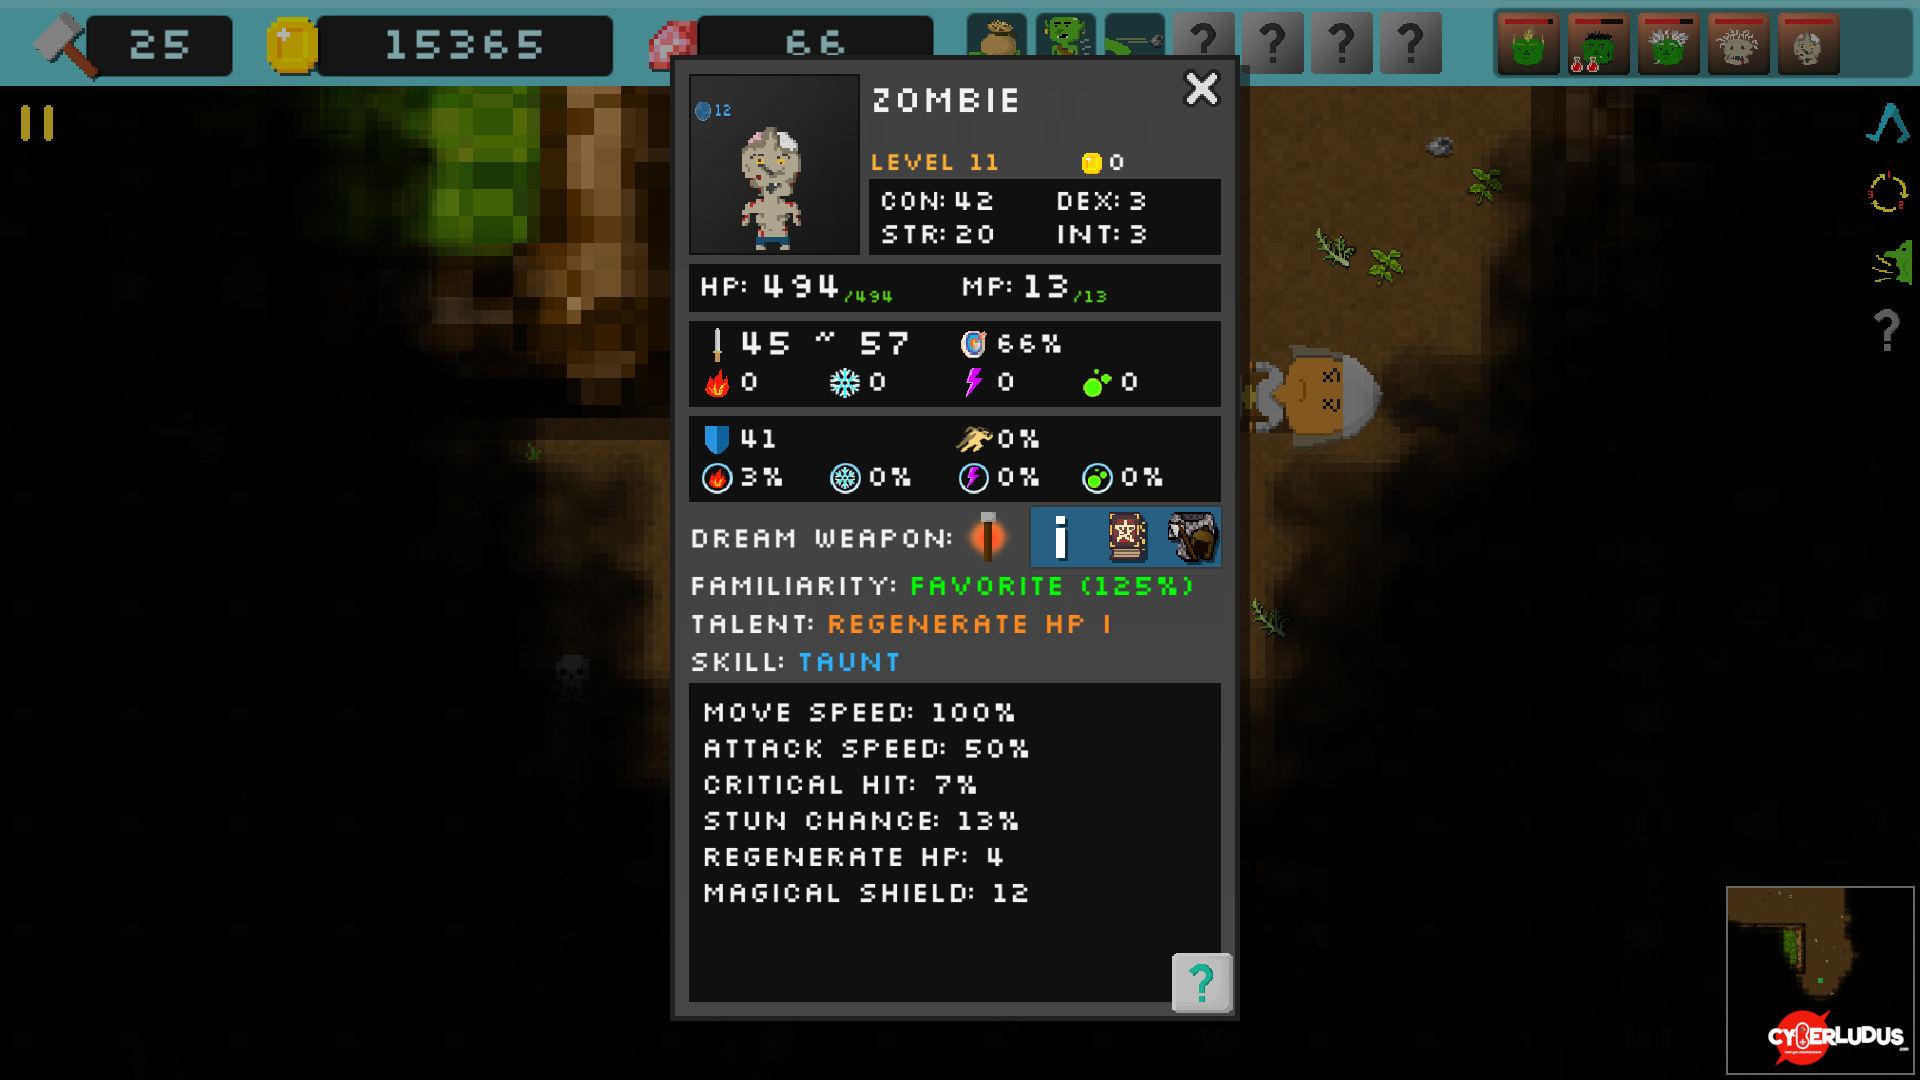 goblins-shop-pc-new-monster